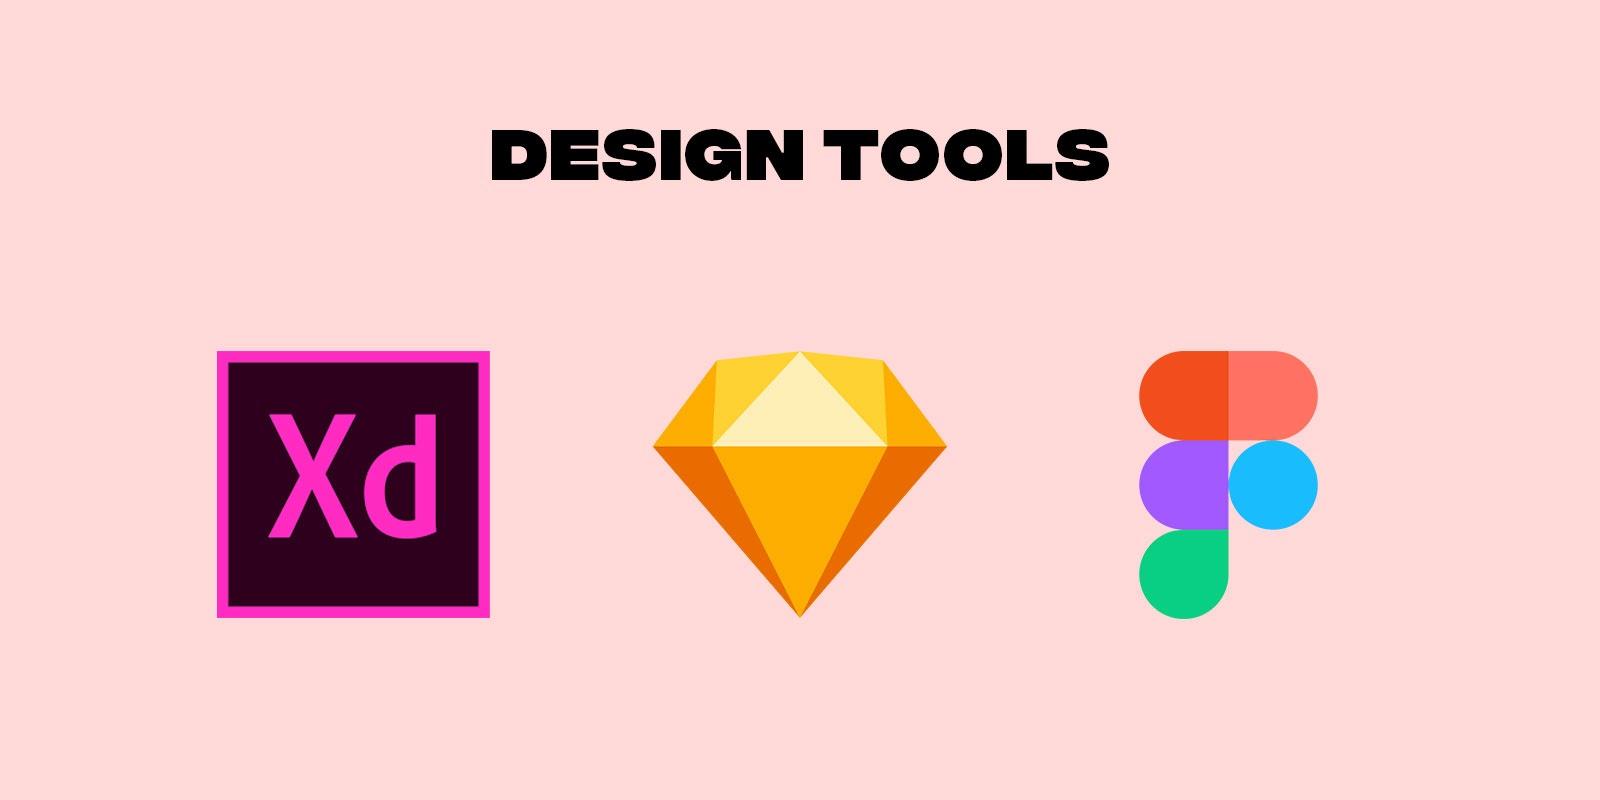 Web design software Adobe XD, Figma and Sketch